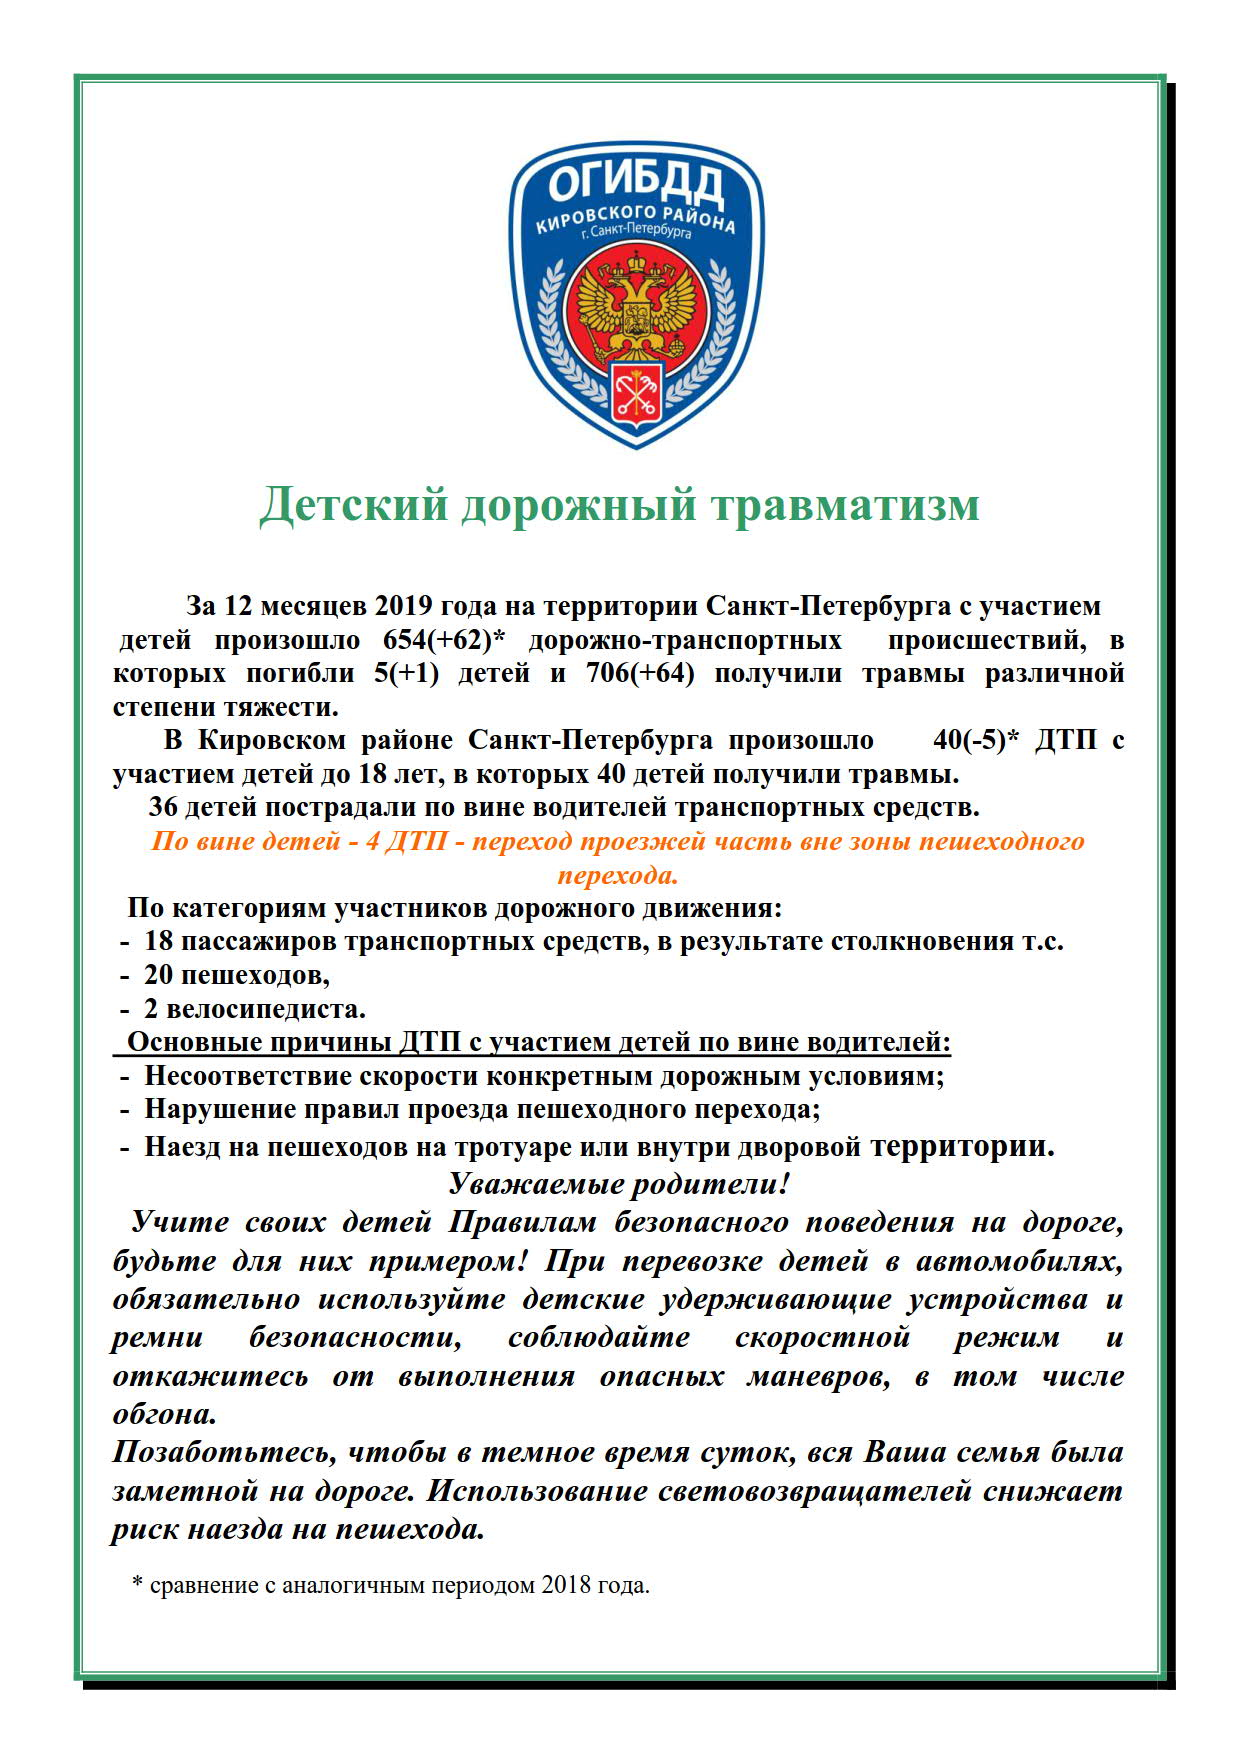 листовка ДДТТ 12 мес 2019_1